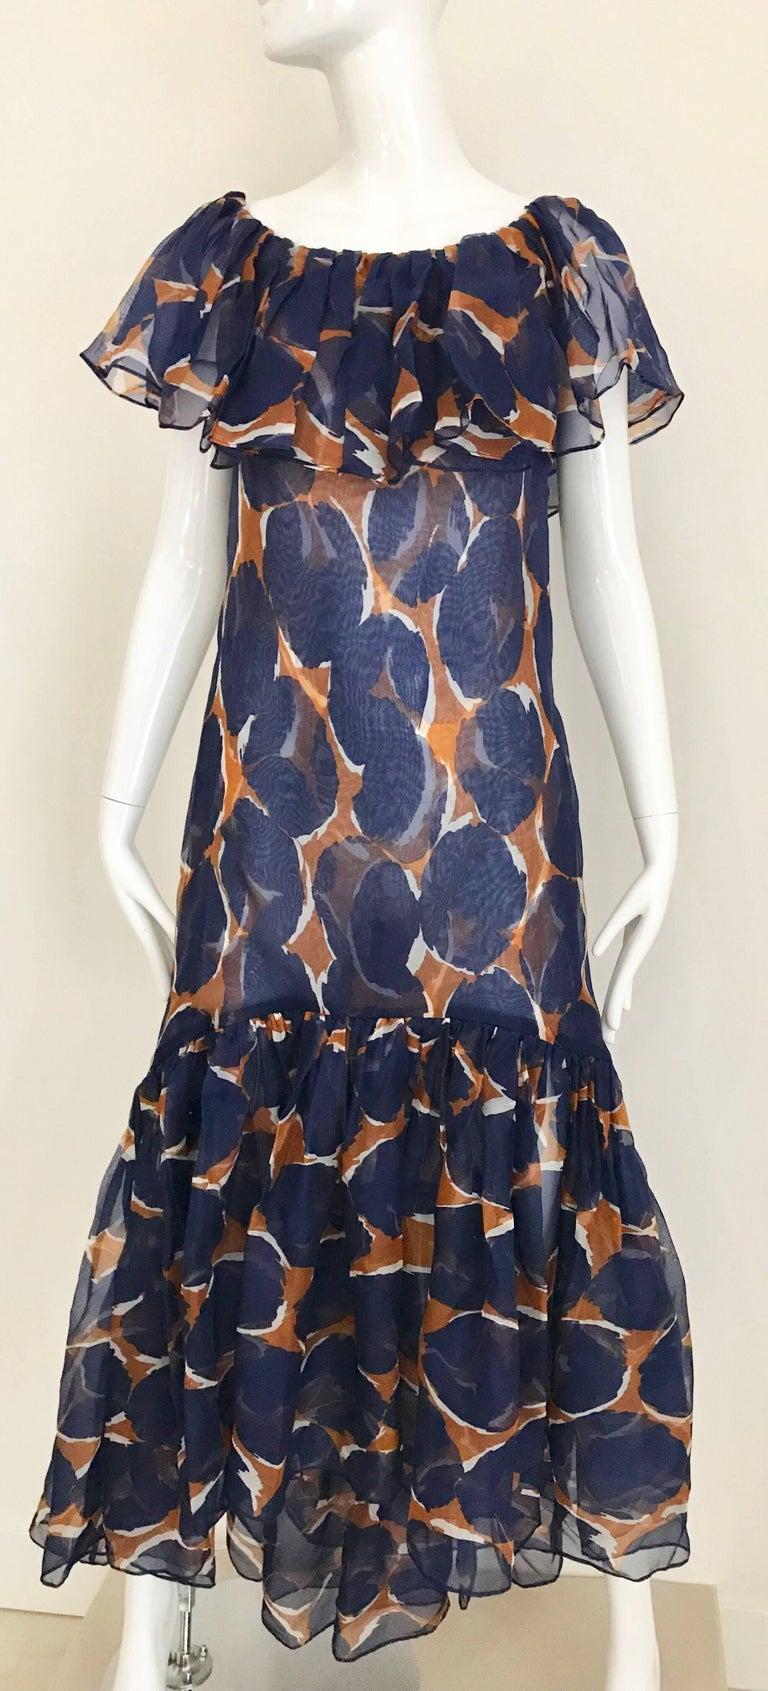 Vintage Yves Saint Laurent Blue and Brown Print Flamenco Style Silk Dress 5